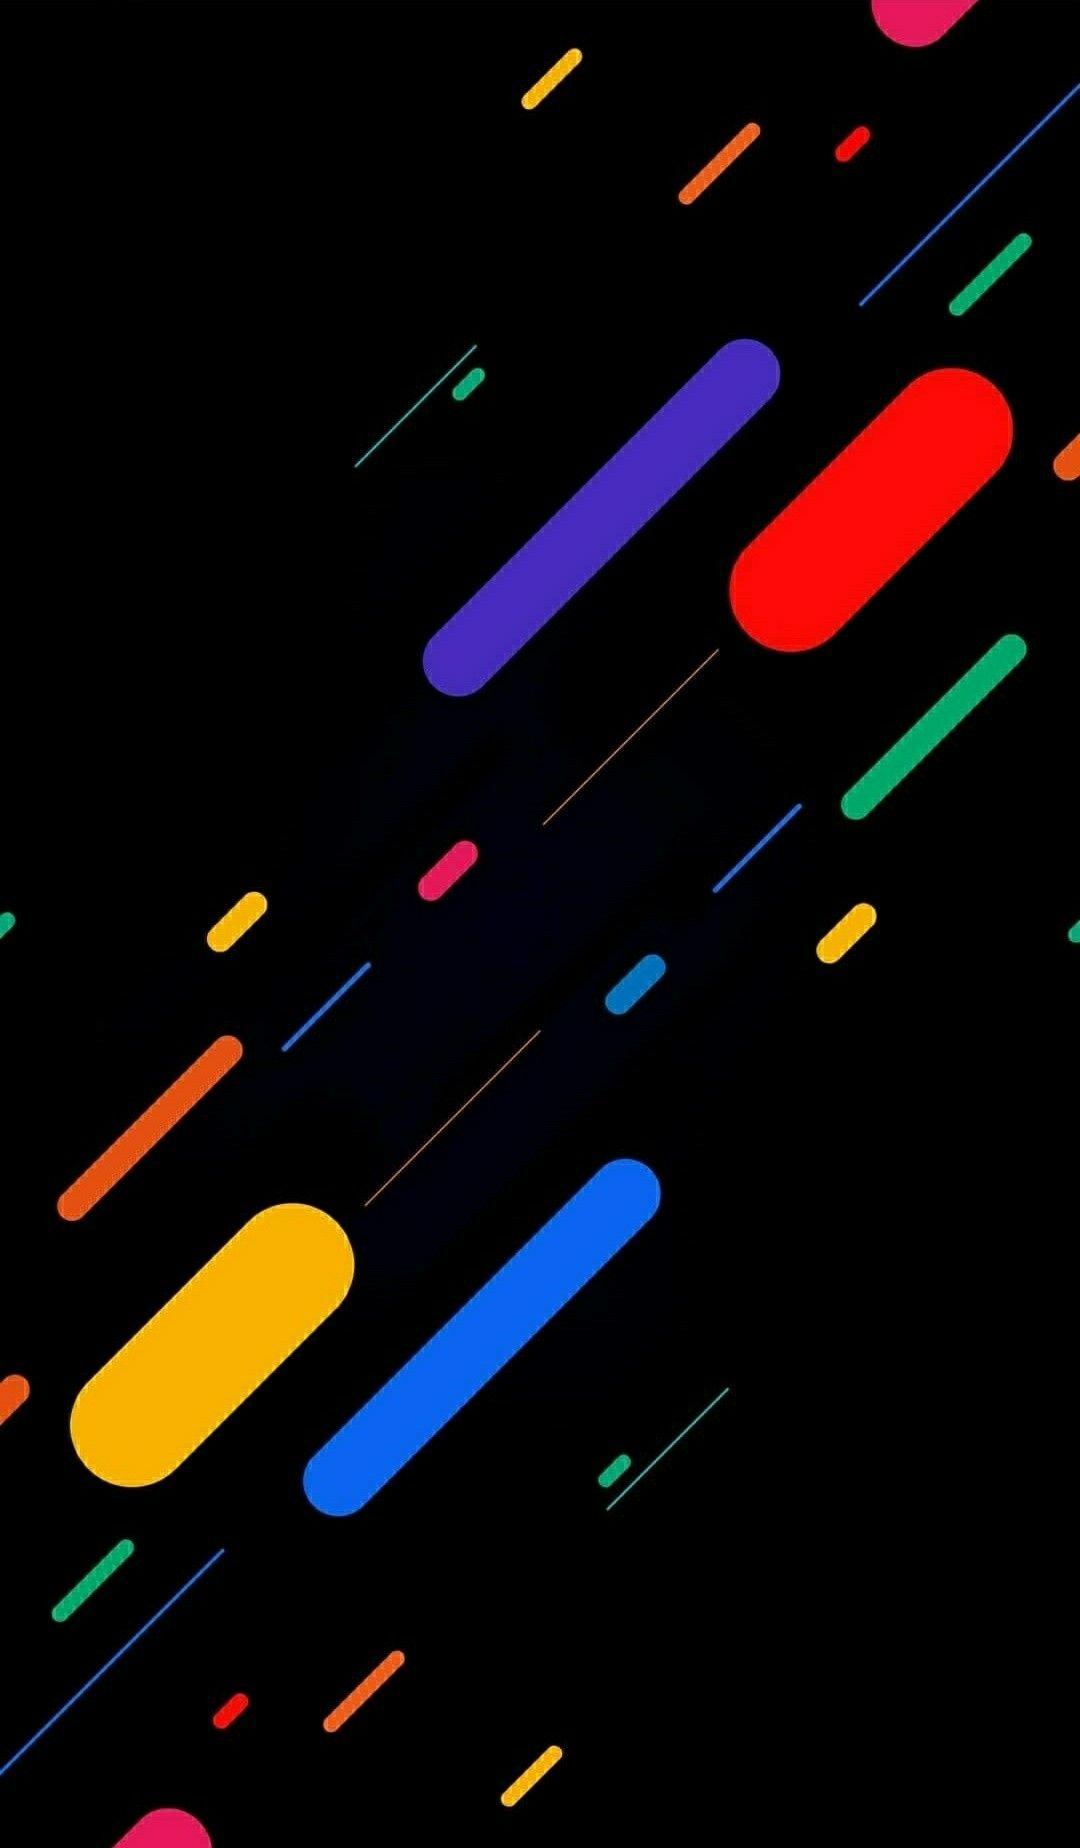 Download 780 Background Abstrak Lucu HD Terbaru